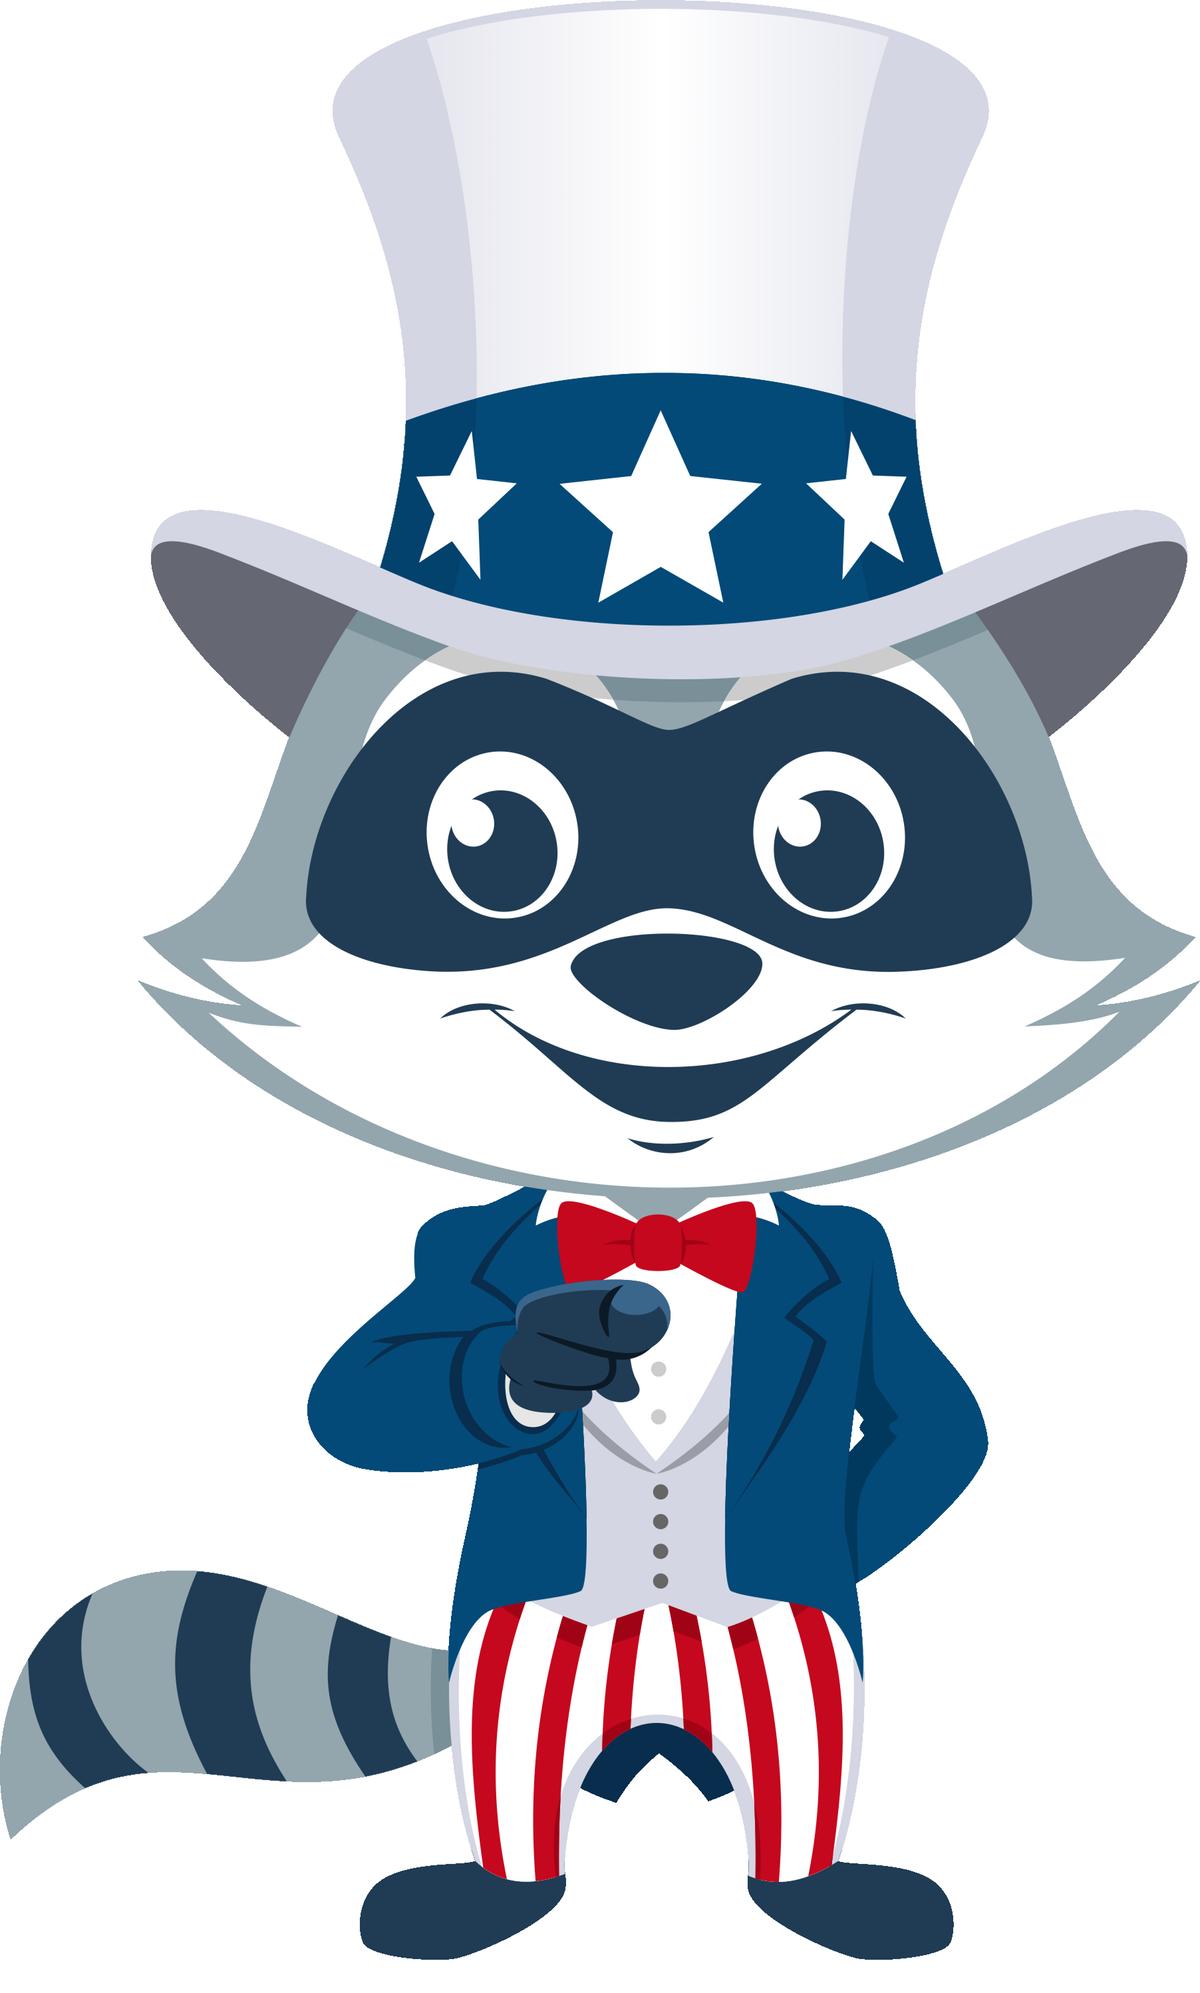 Uncle Sam version of Fixxy